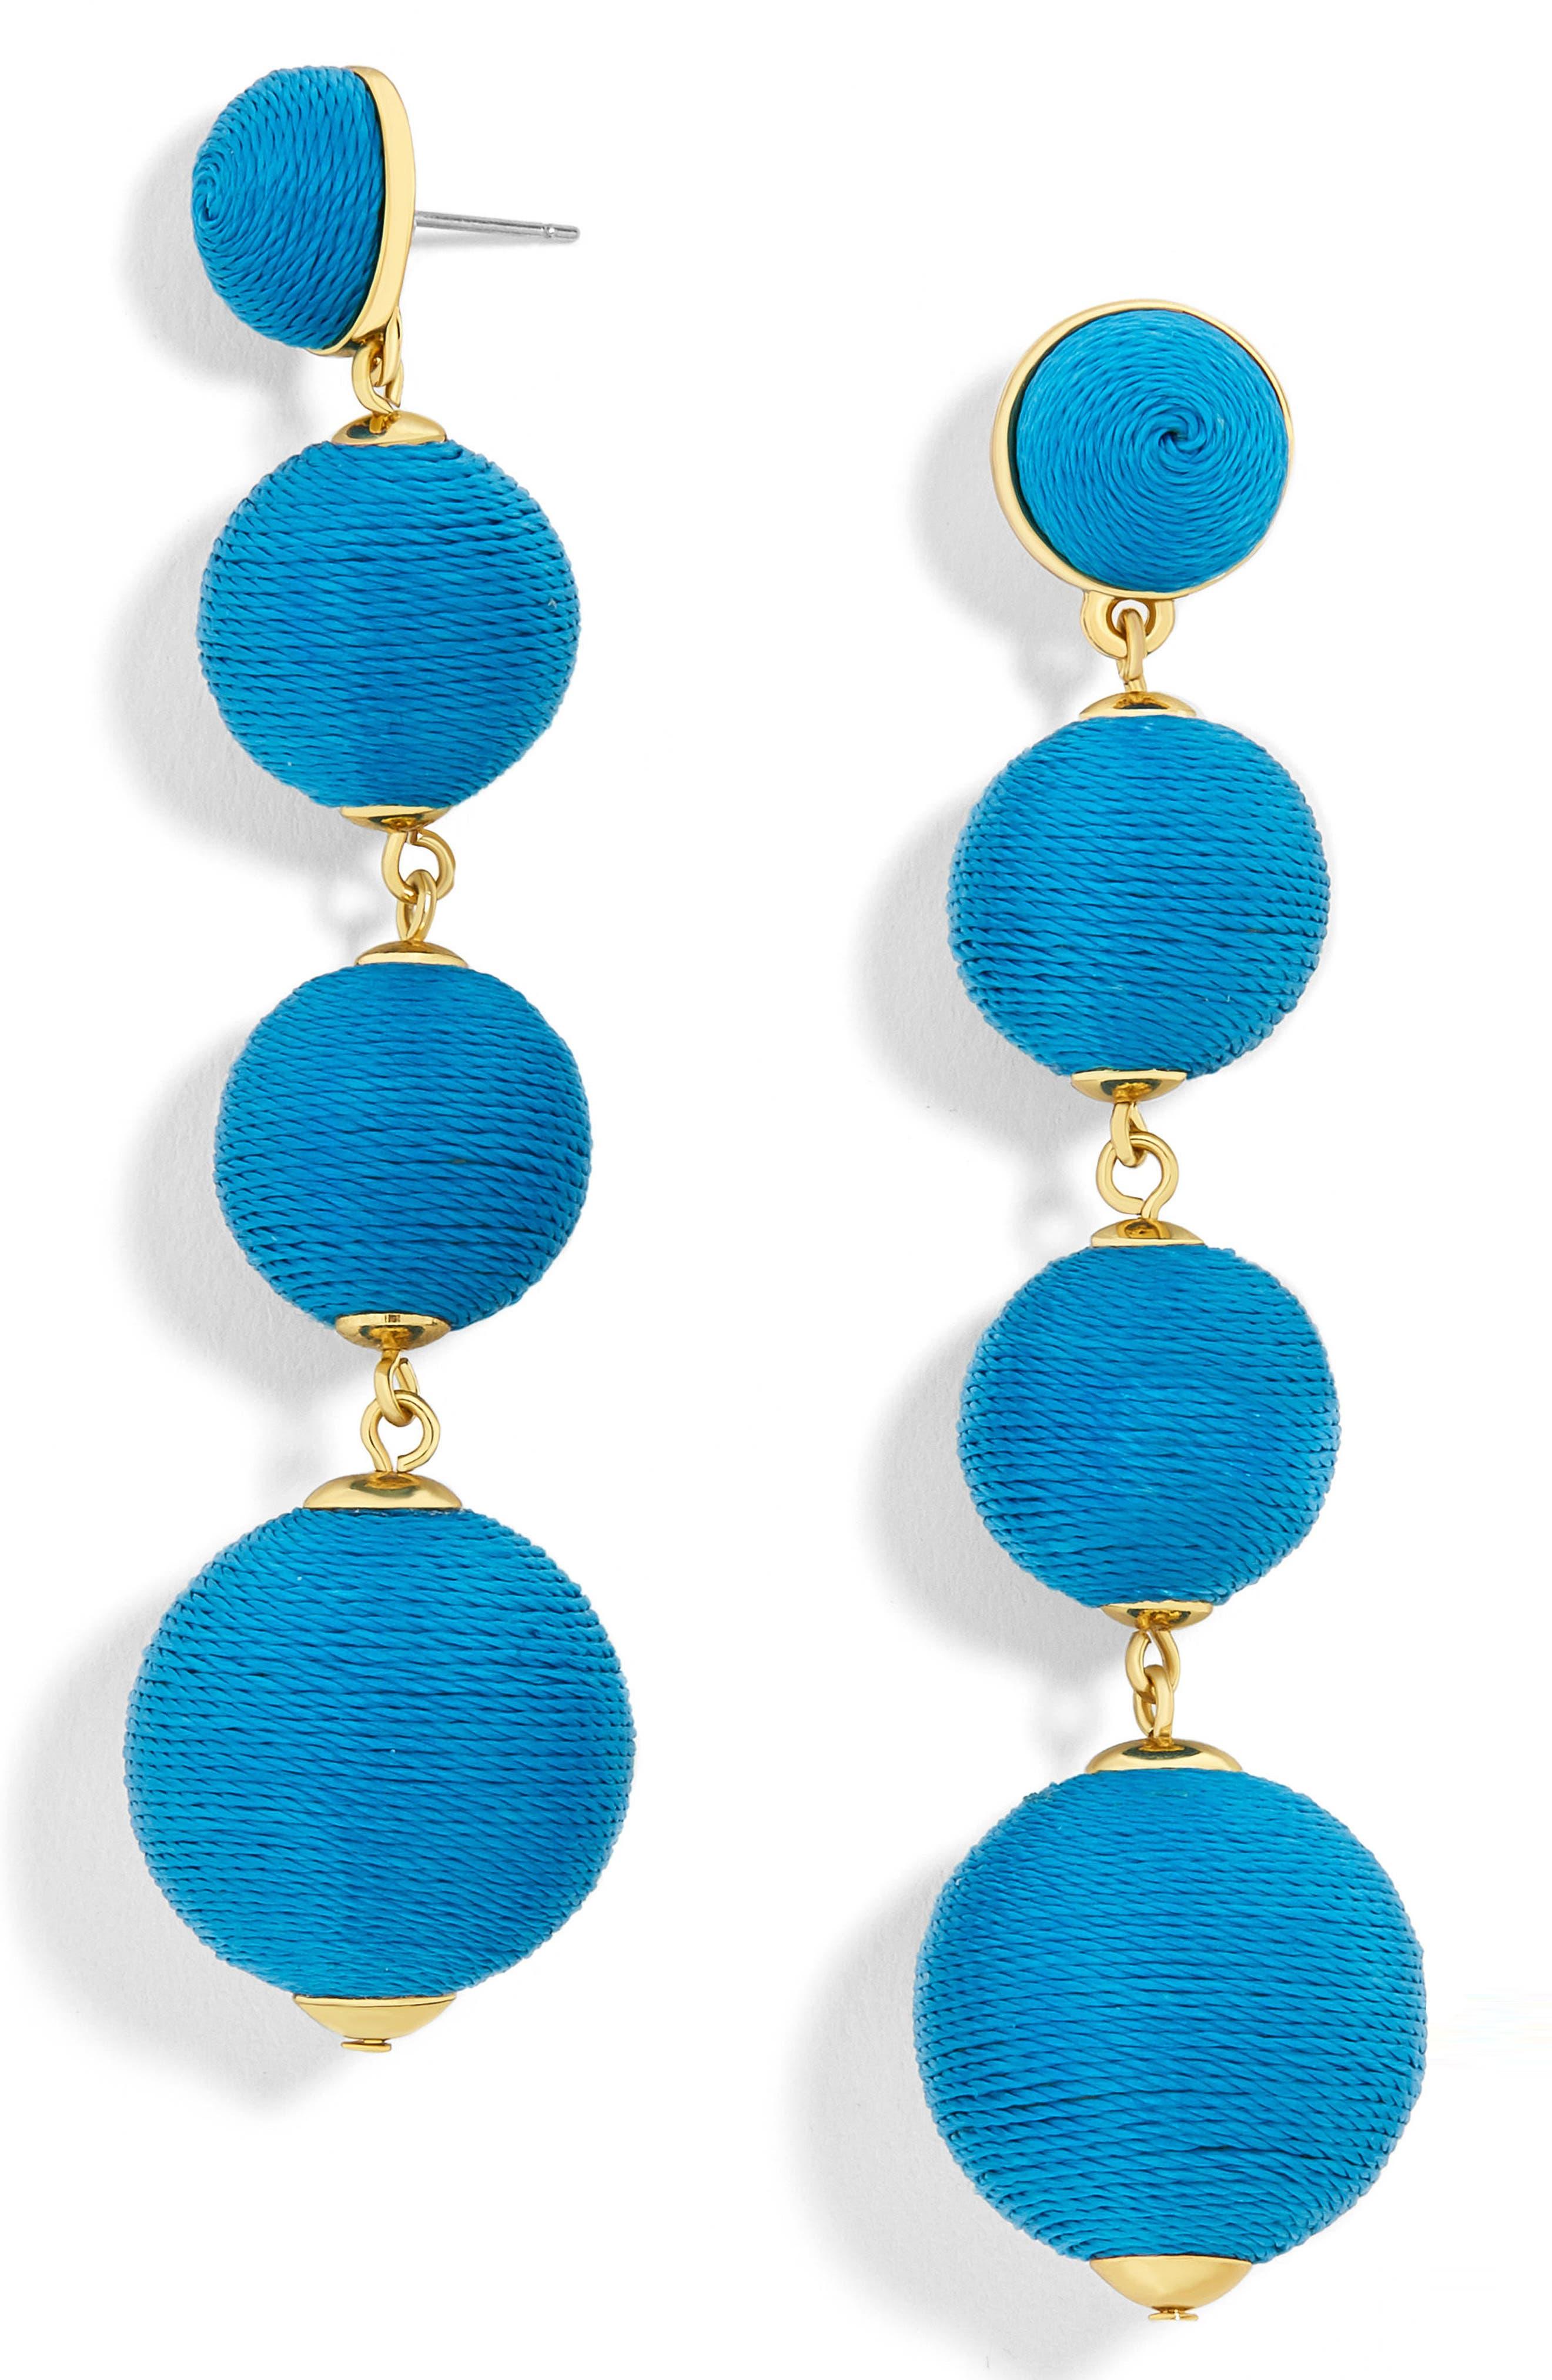 Criselda Ball Shoulder Duster Earrings,                             Main thumbnail 3, color,